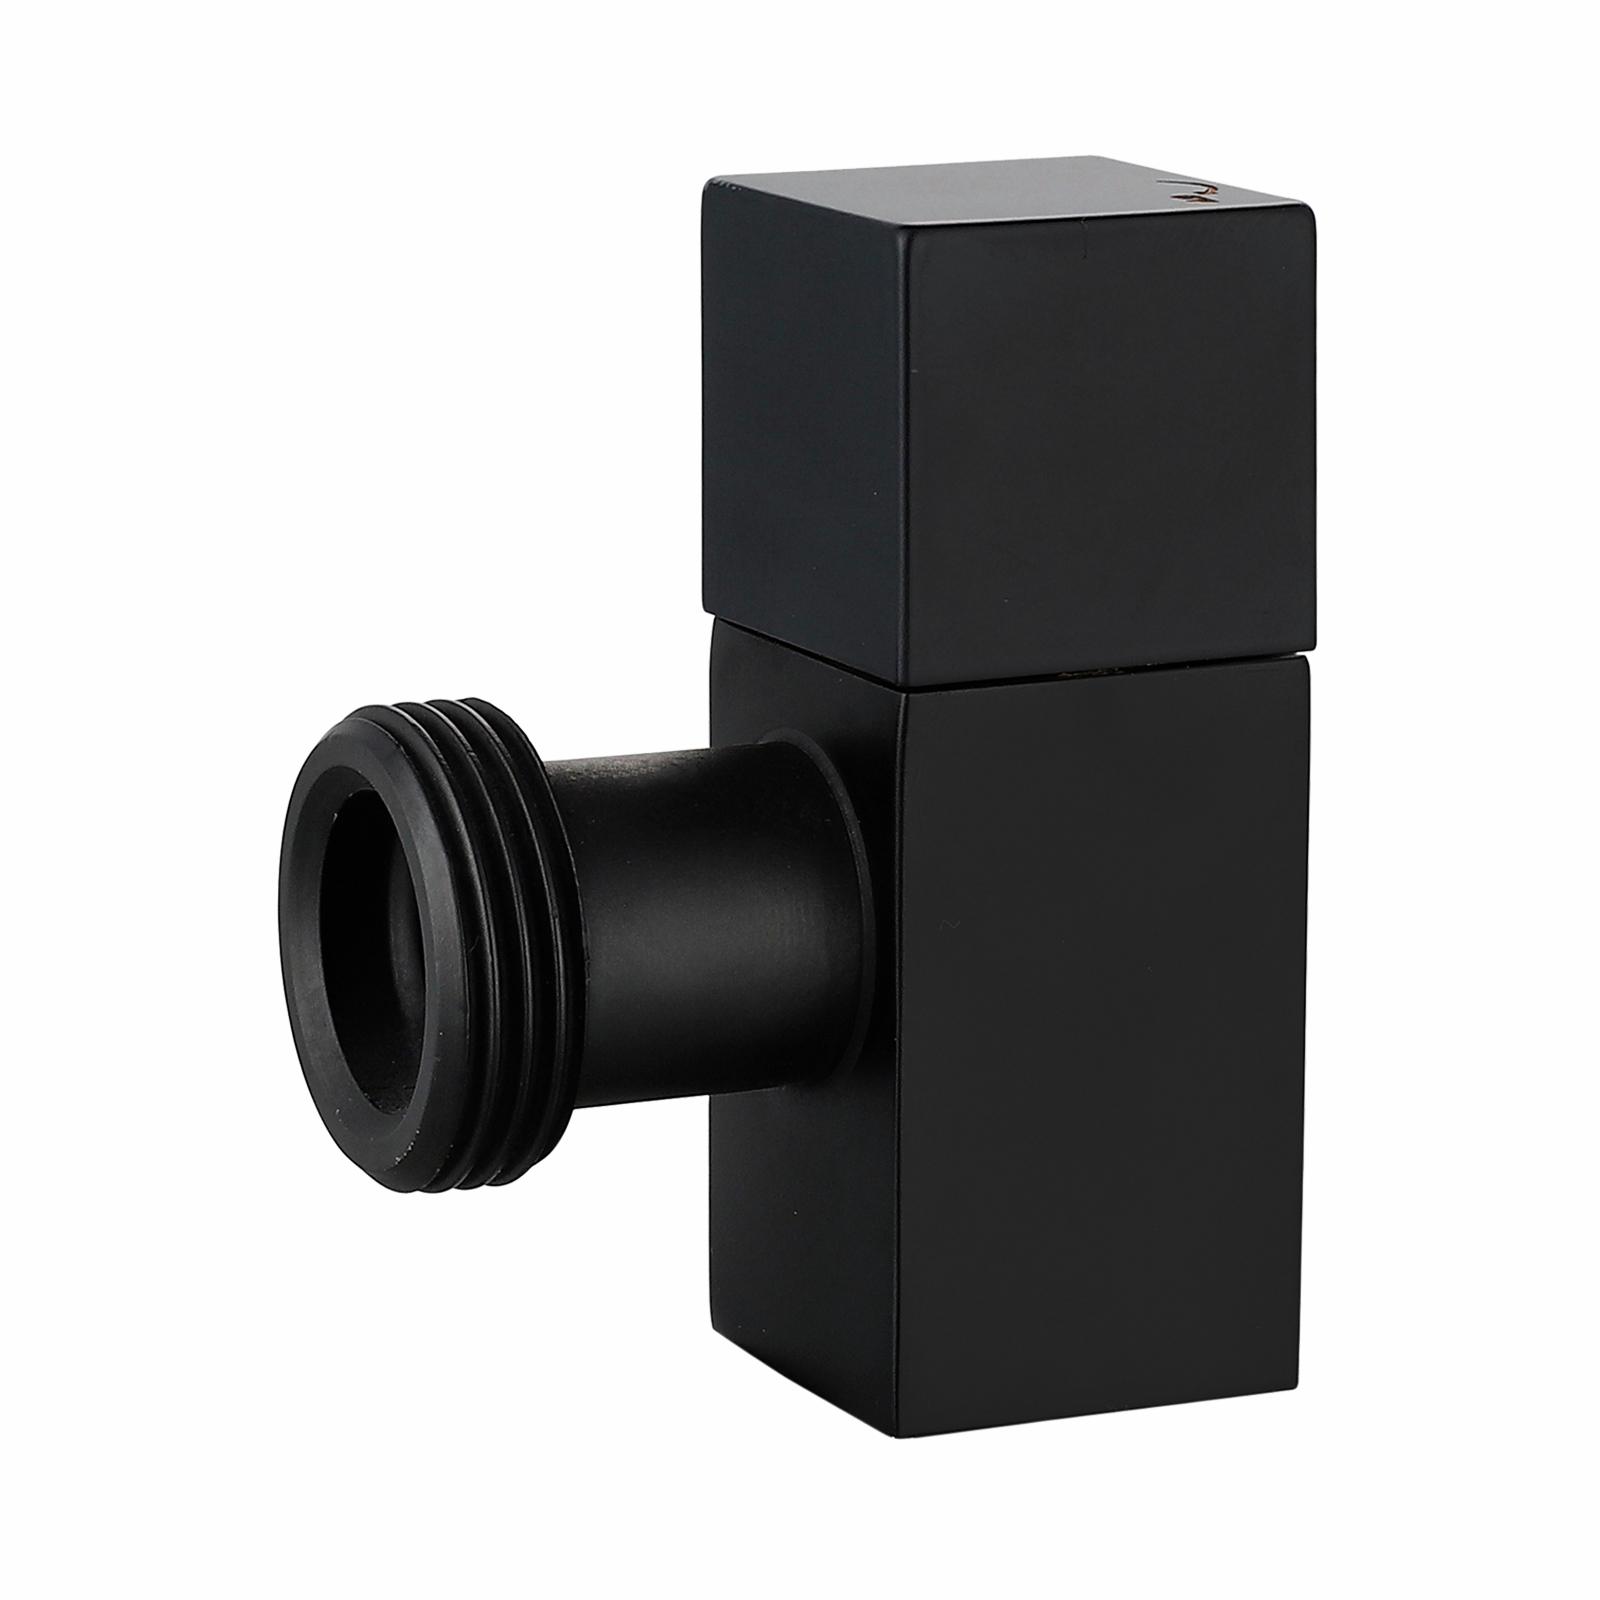 Kinetic 20mm Matte Black Brass Square Washing Machine Cock